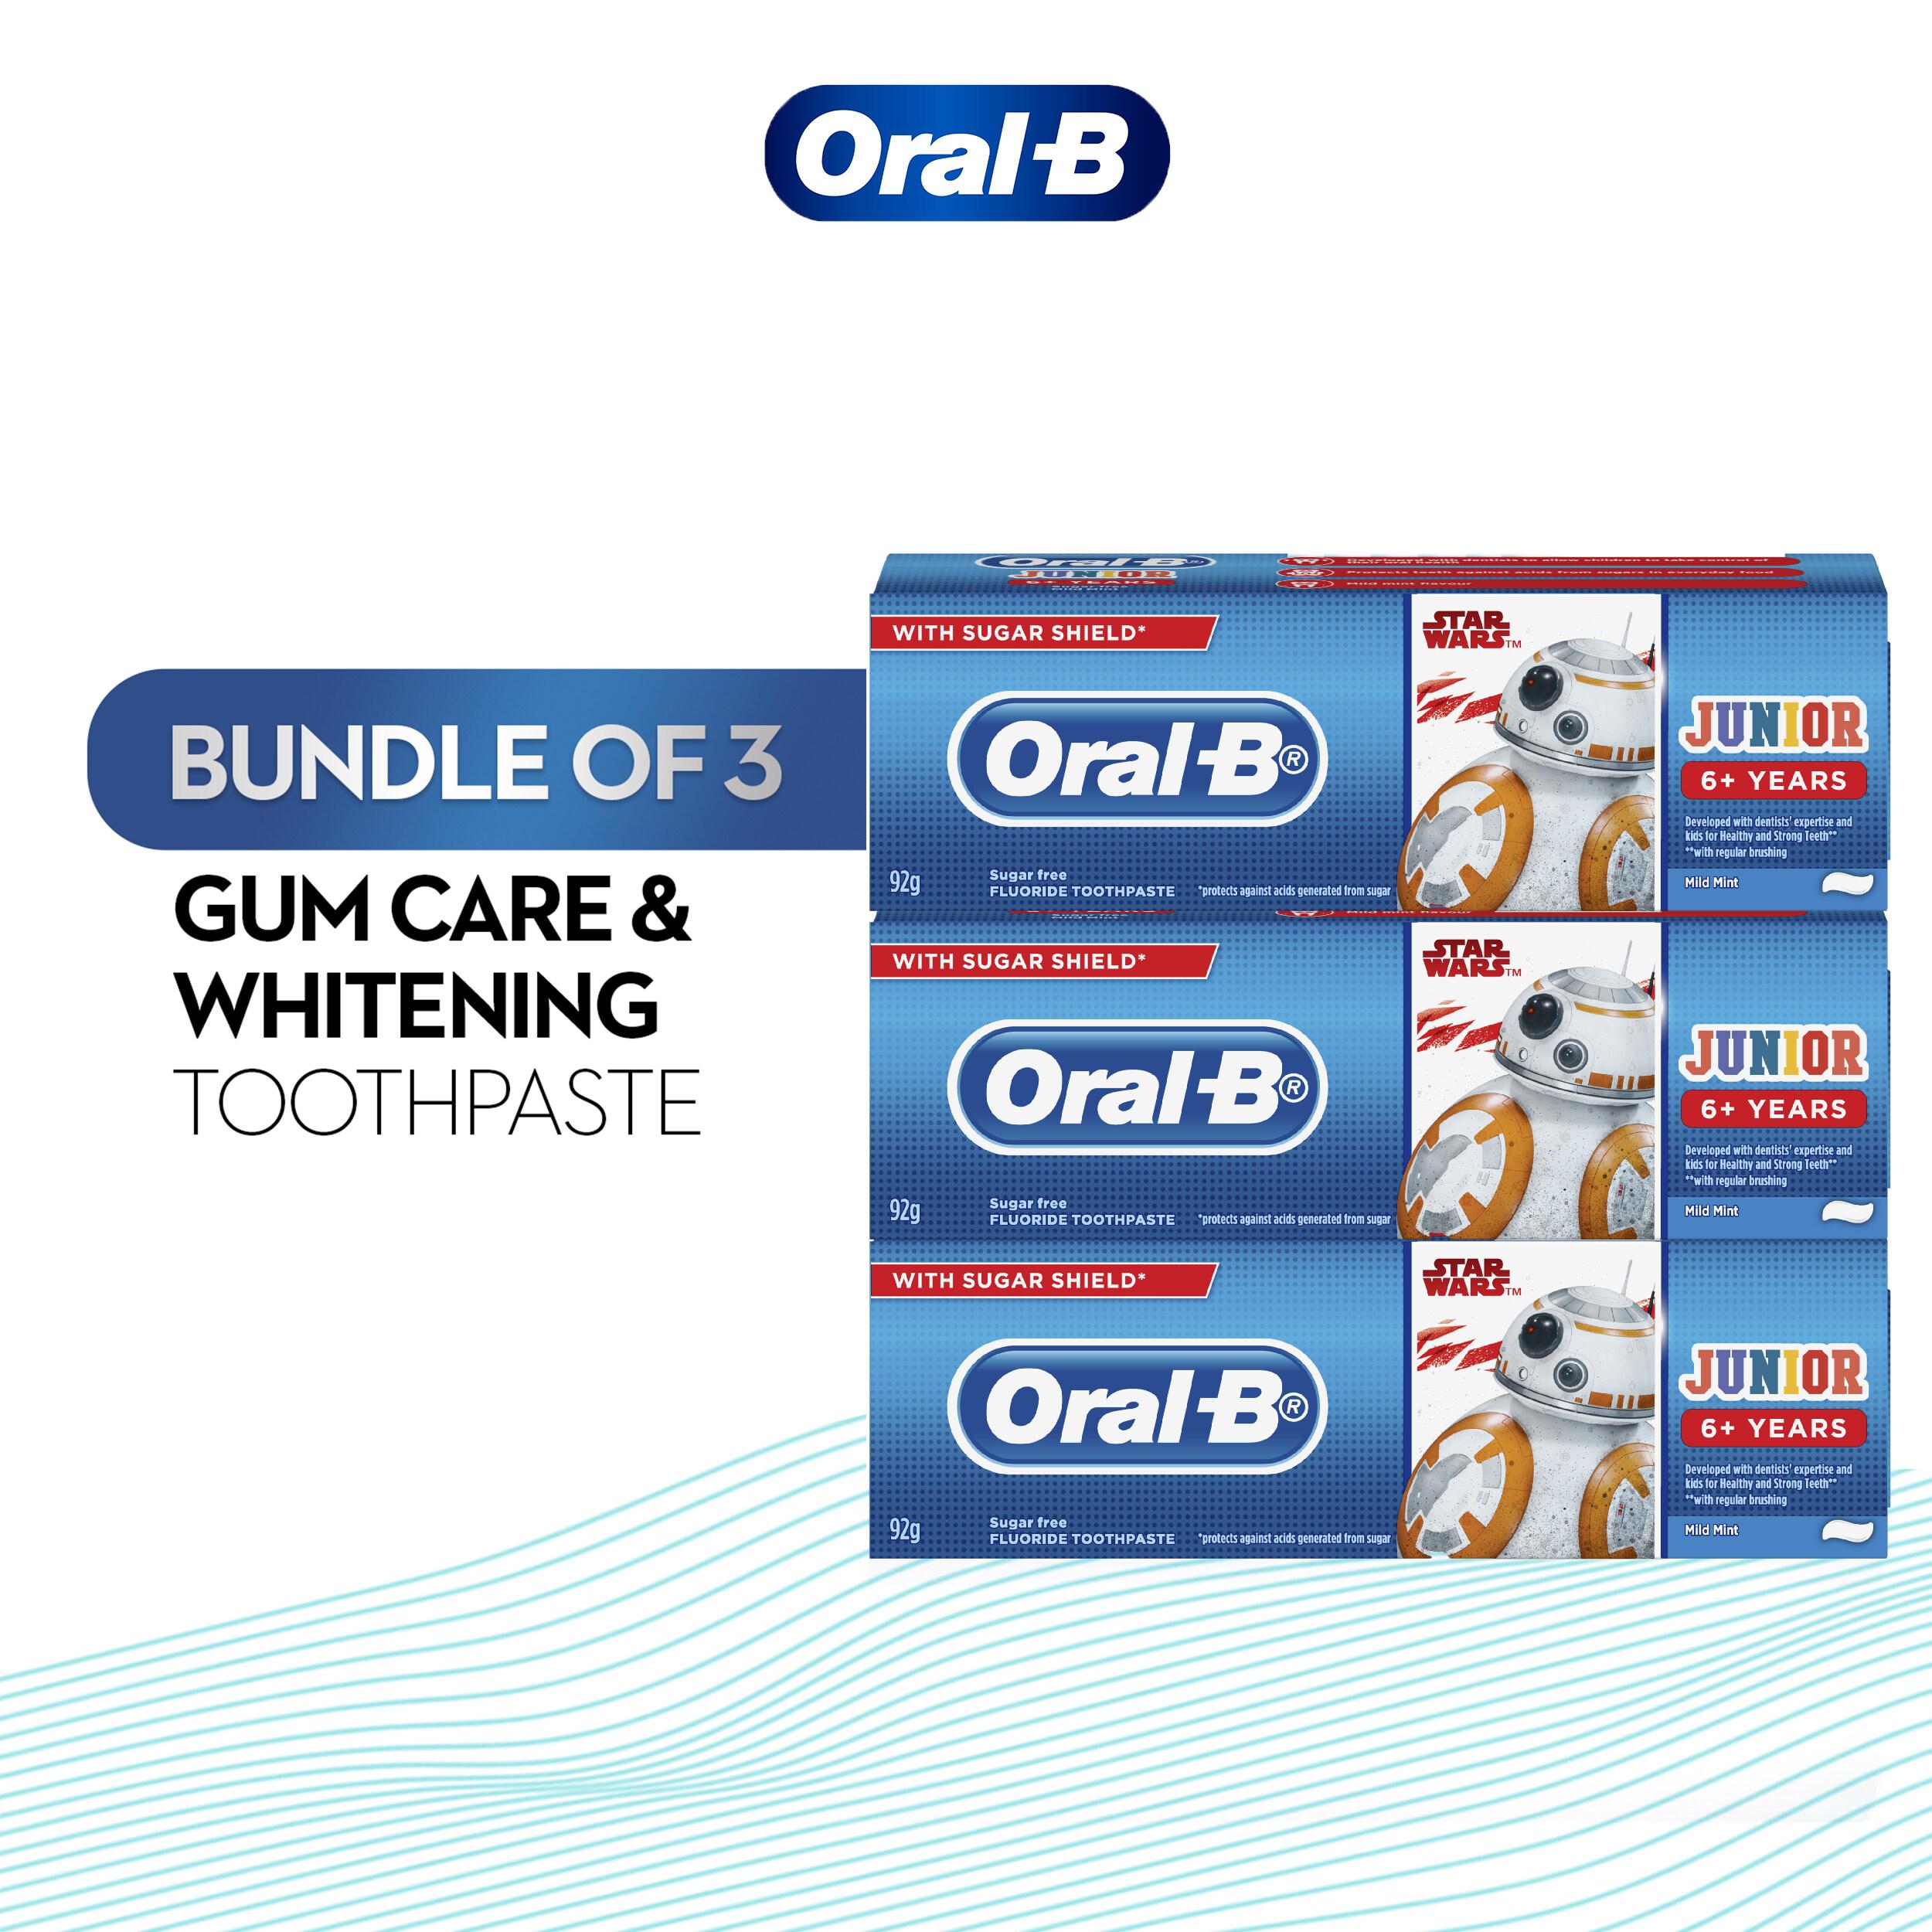 Oral-B Kids Starwars Junior 6+ Years Toothpaste 92g [BUNDLE OF 3]